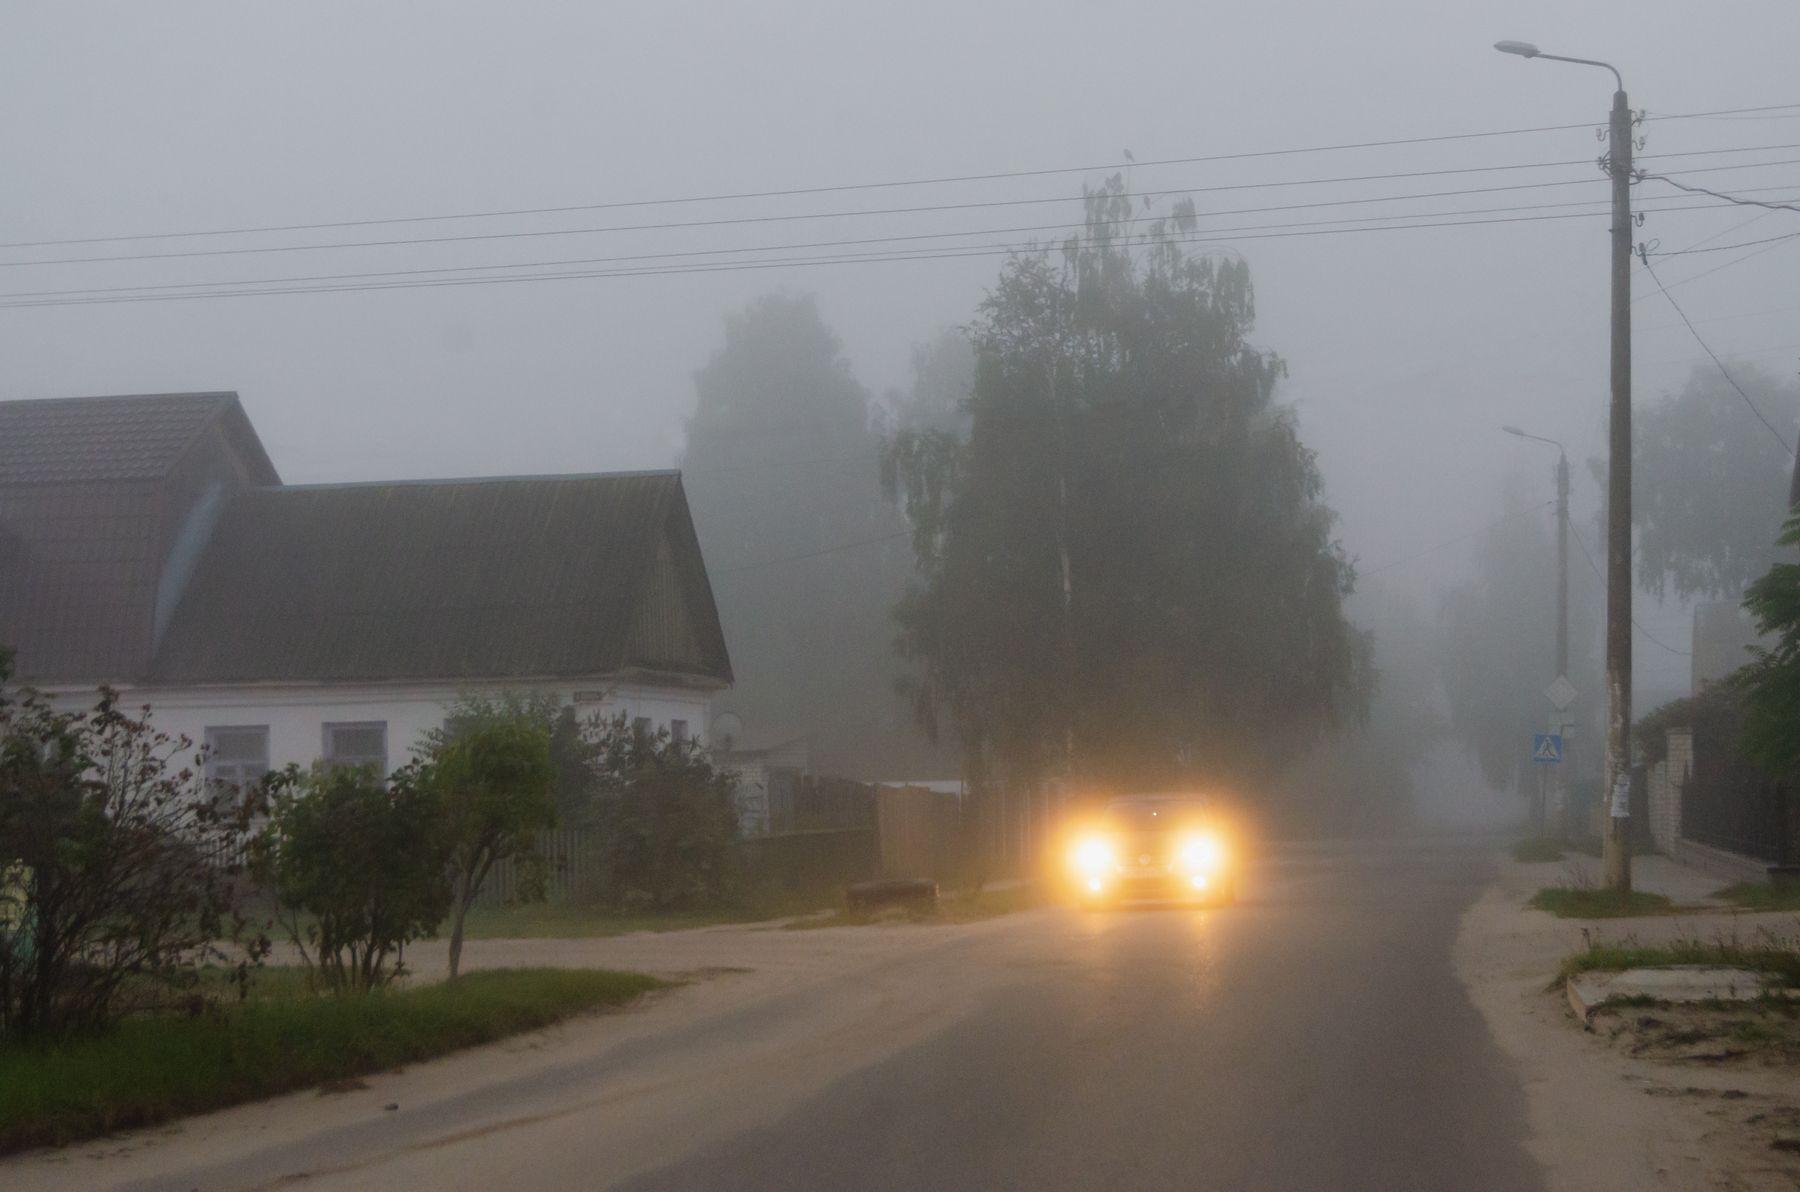 В тумане дорога машина туман утро дома